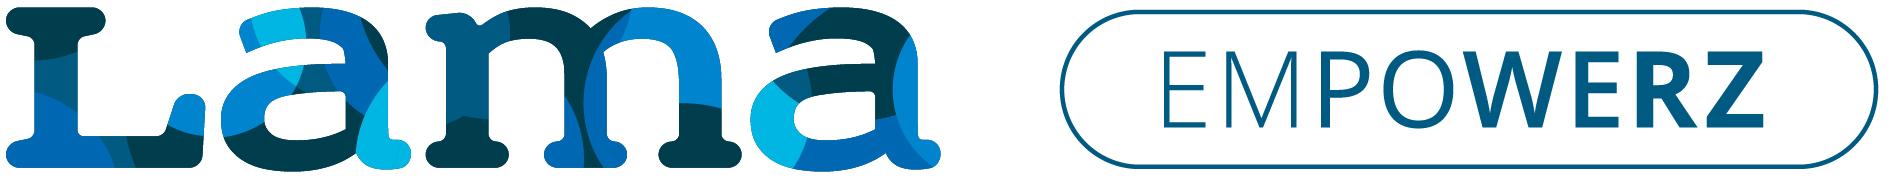 logo_outline_empowerz_lama_2019_rgb